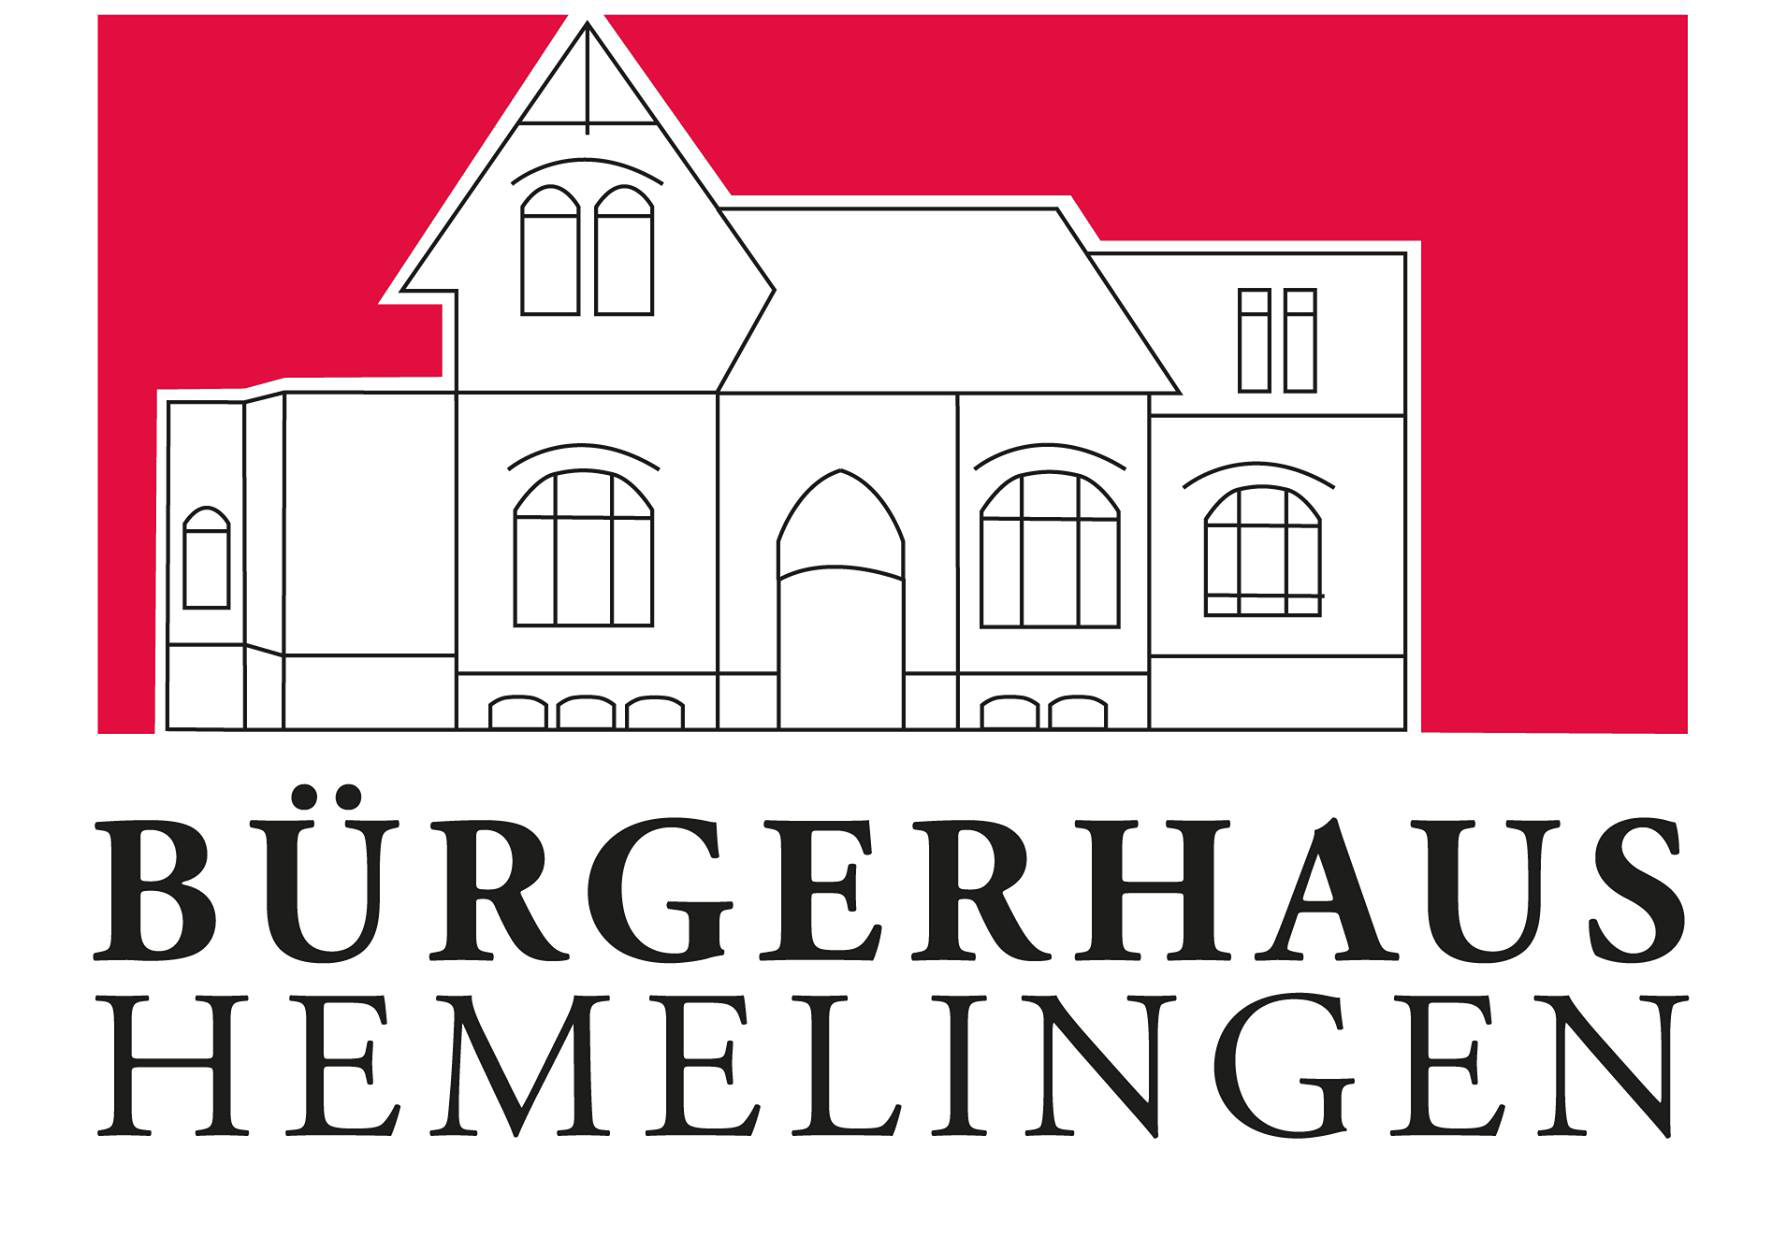 Bürgerhaus Hemelingen